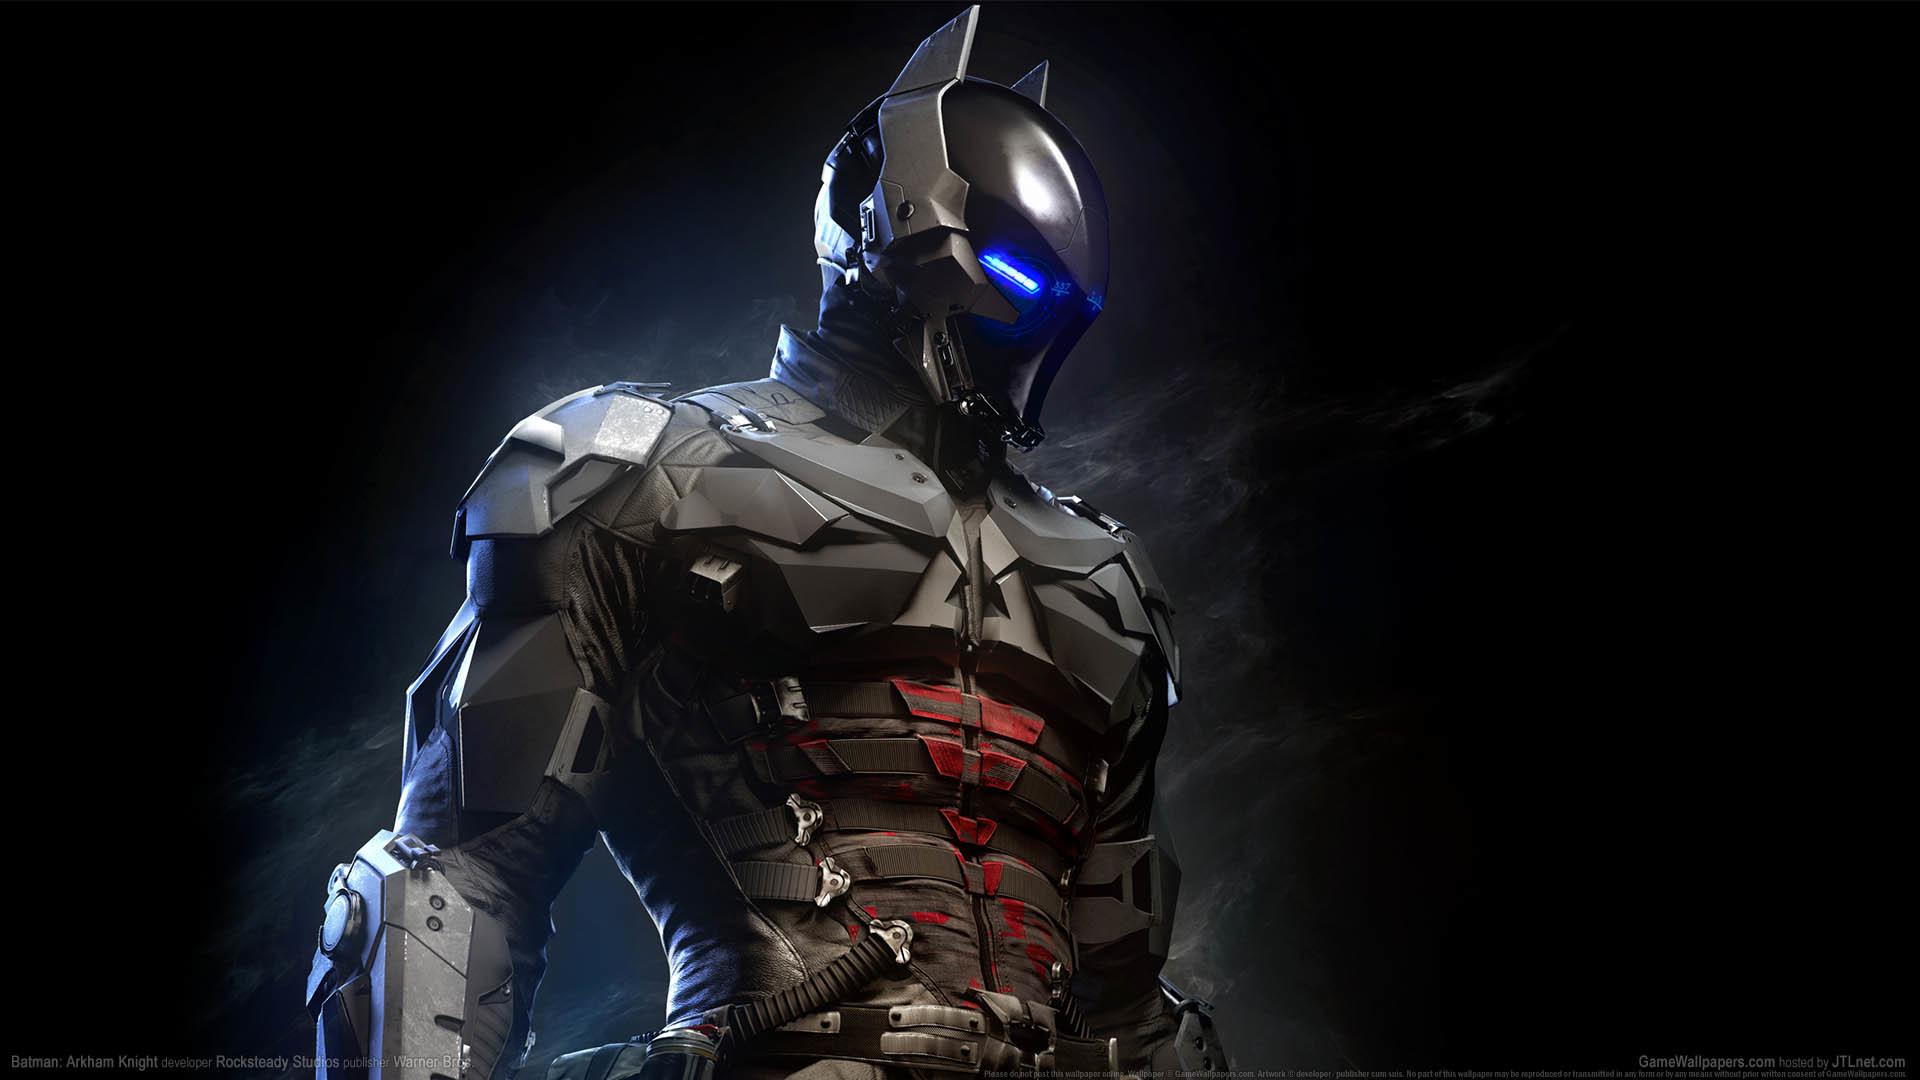 Nightwing Batman Robin in Batman Arkham Knight Wallpaper k cool